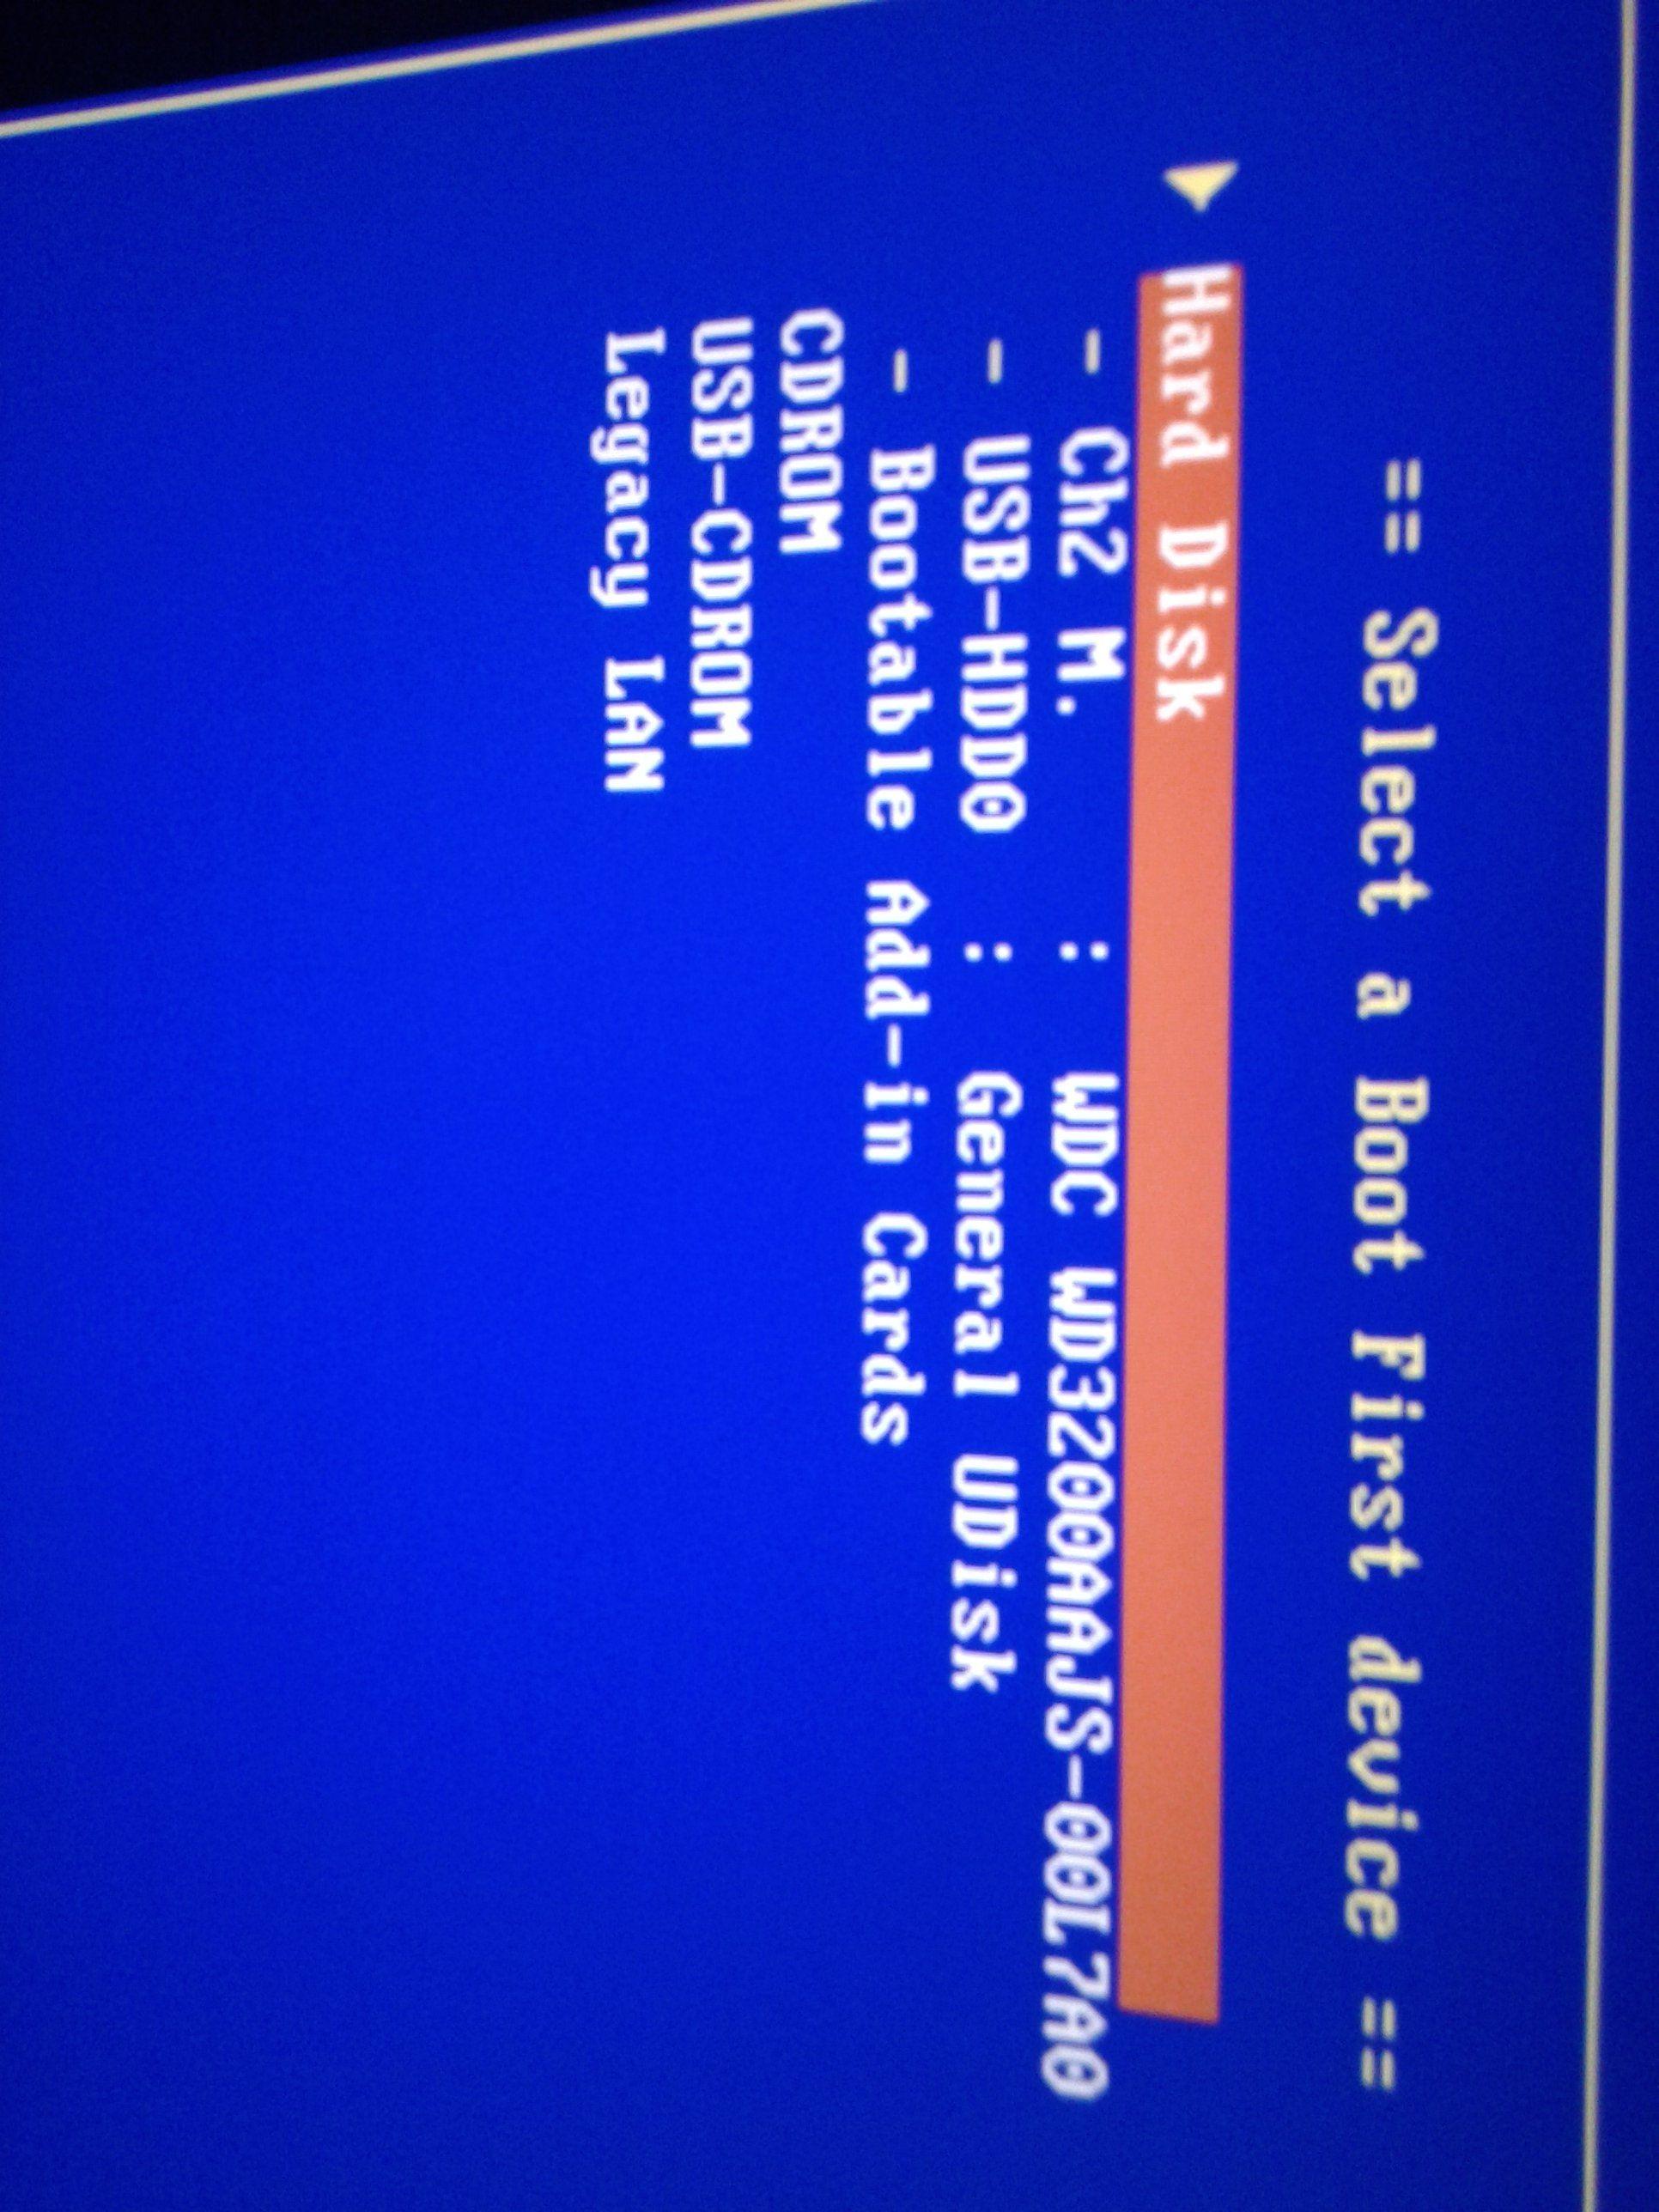 Eski bilgisayara Windows 10 kurma